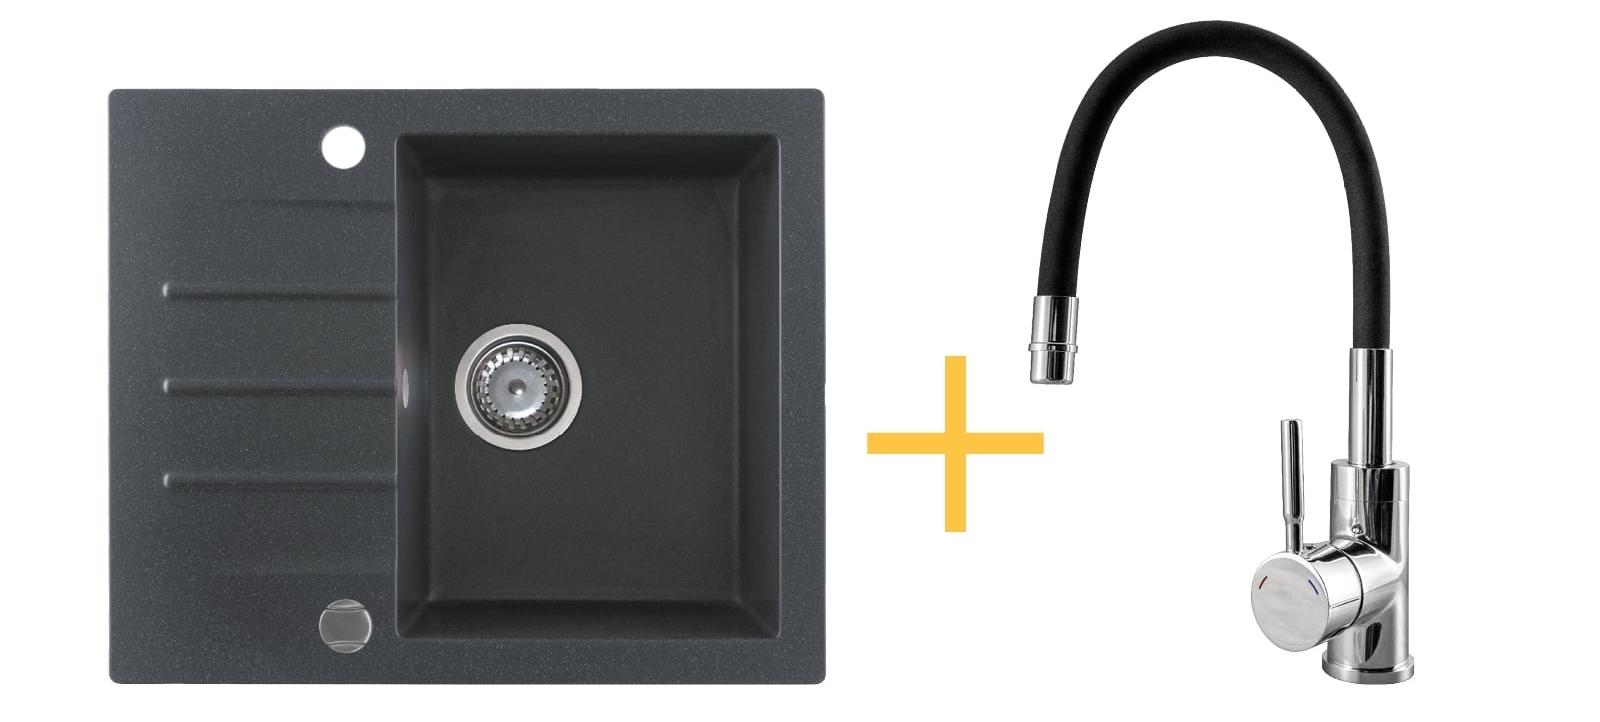 Zestaw zlewozmywak granitowy Kernau KGS A 4560 1B1D Black Metallic + bateria KWT 29 Elastic Black